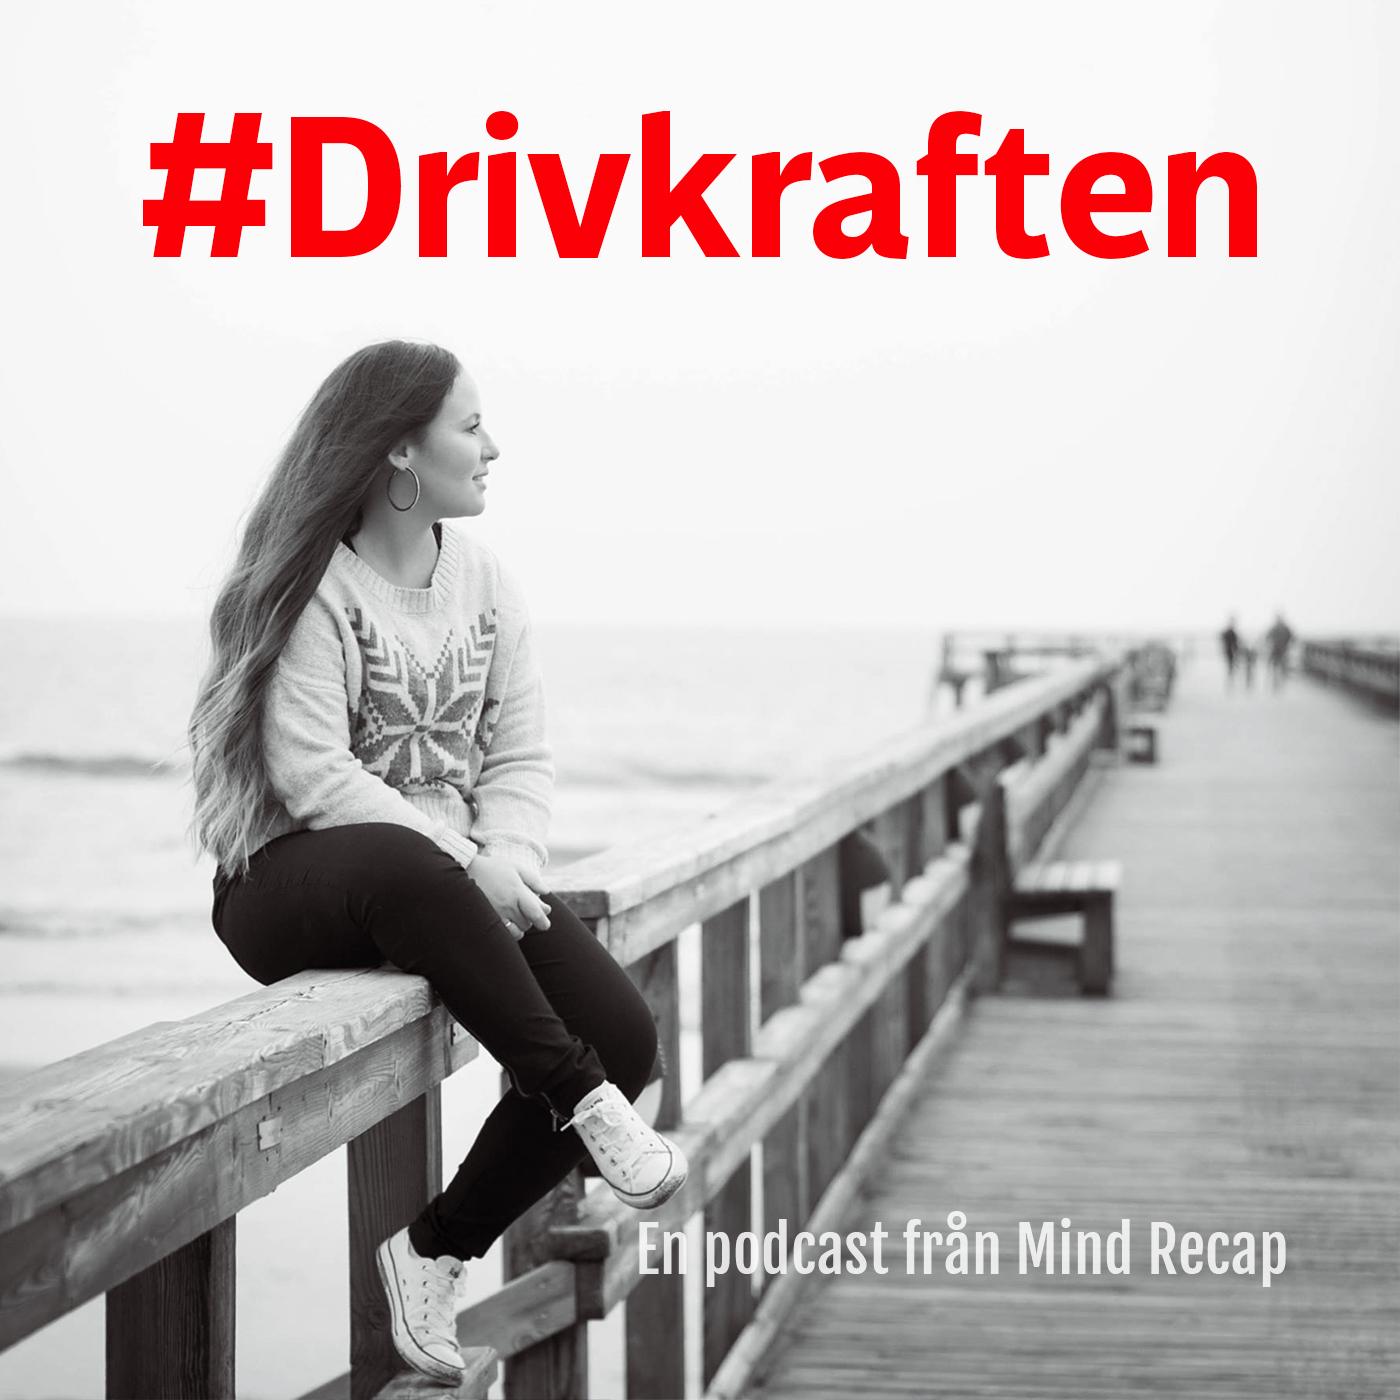 Drivkraften's podcast